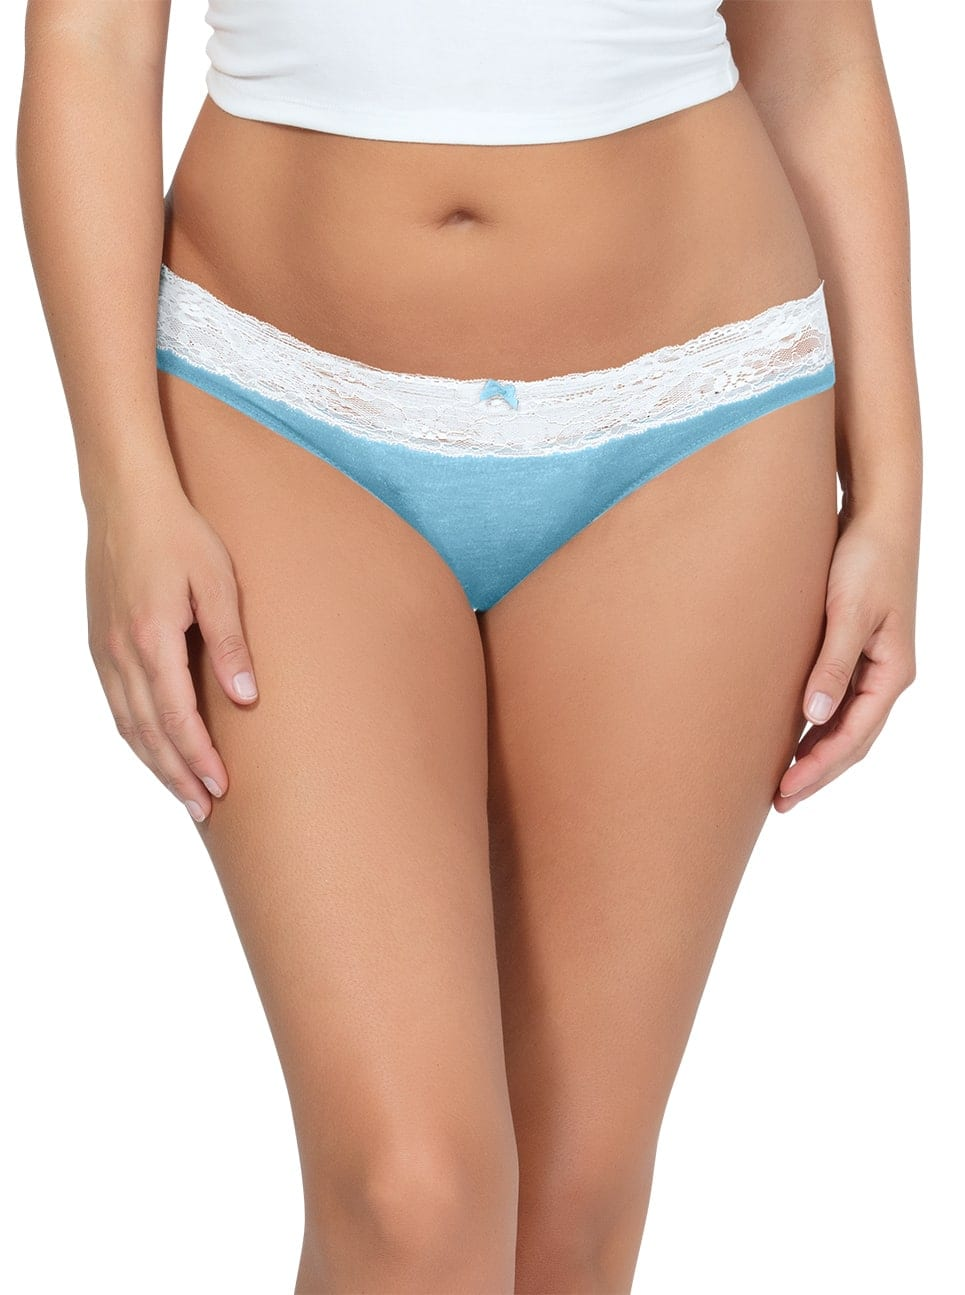 PARFAIT ParfaitPanty SoEssential BikiniPP303 SkyBlueIvory Front - Parfait Panty So Essential Bikini- Skyblue - PP303